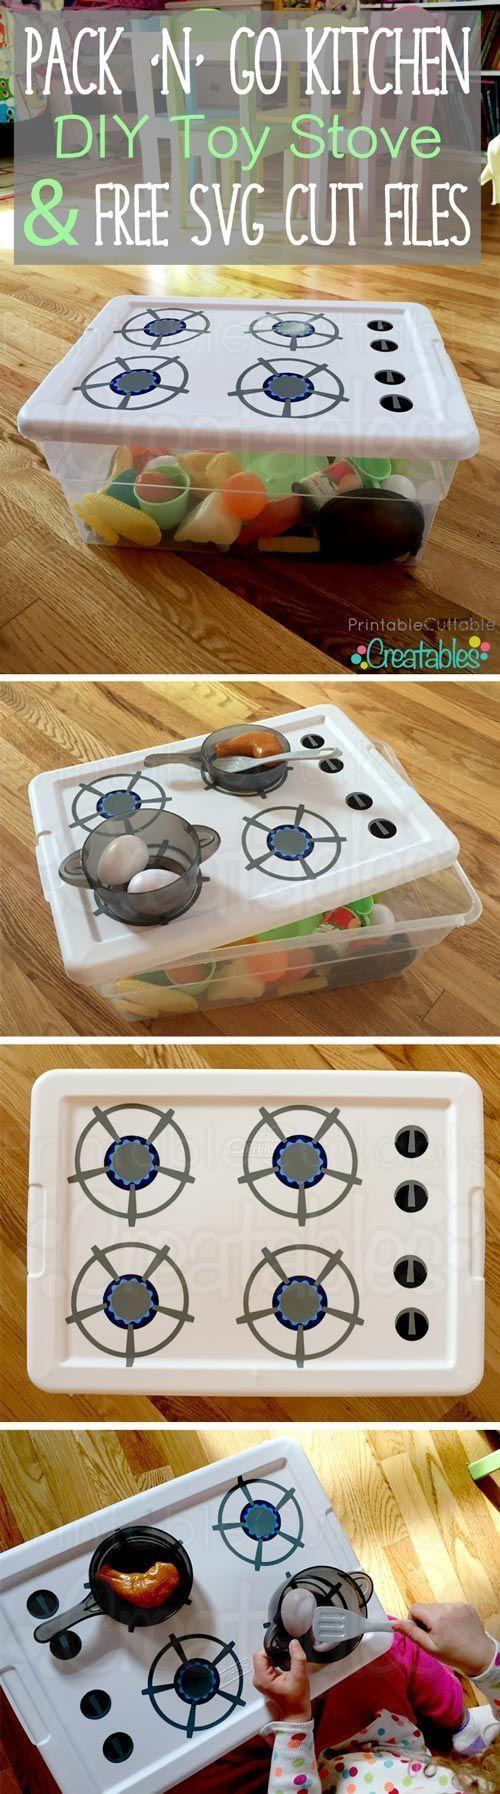 Kitchen Ideas Kitchen Ideas Kitchen Ideas Kitchen Ideas Kitchen Ideas Kitchen Ideas Kitchen Ideas Kitchen Ideas Kitchen Ideas Kitchen Ideas Kitchen Ideas Kitchen Ideas Ki...